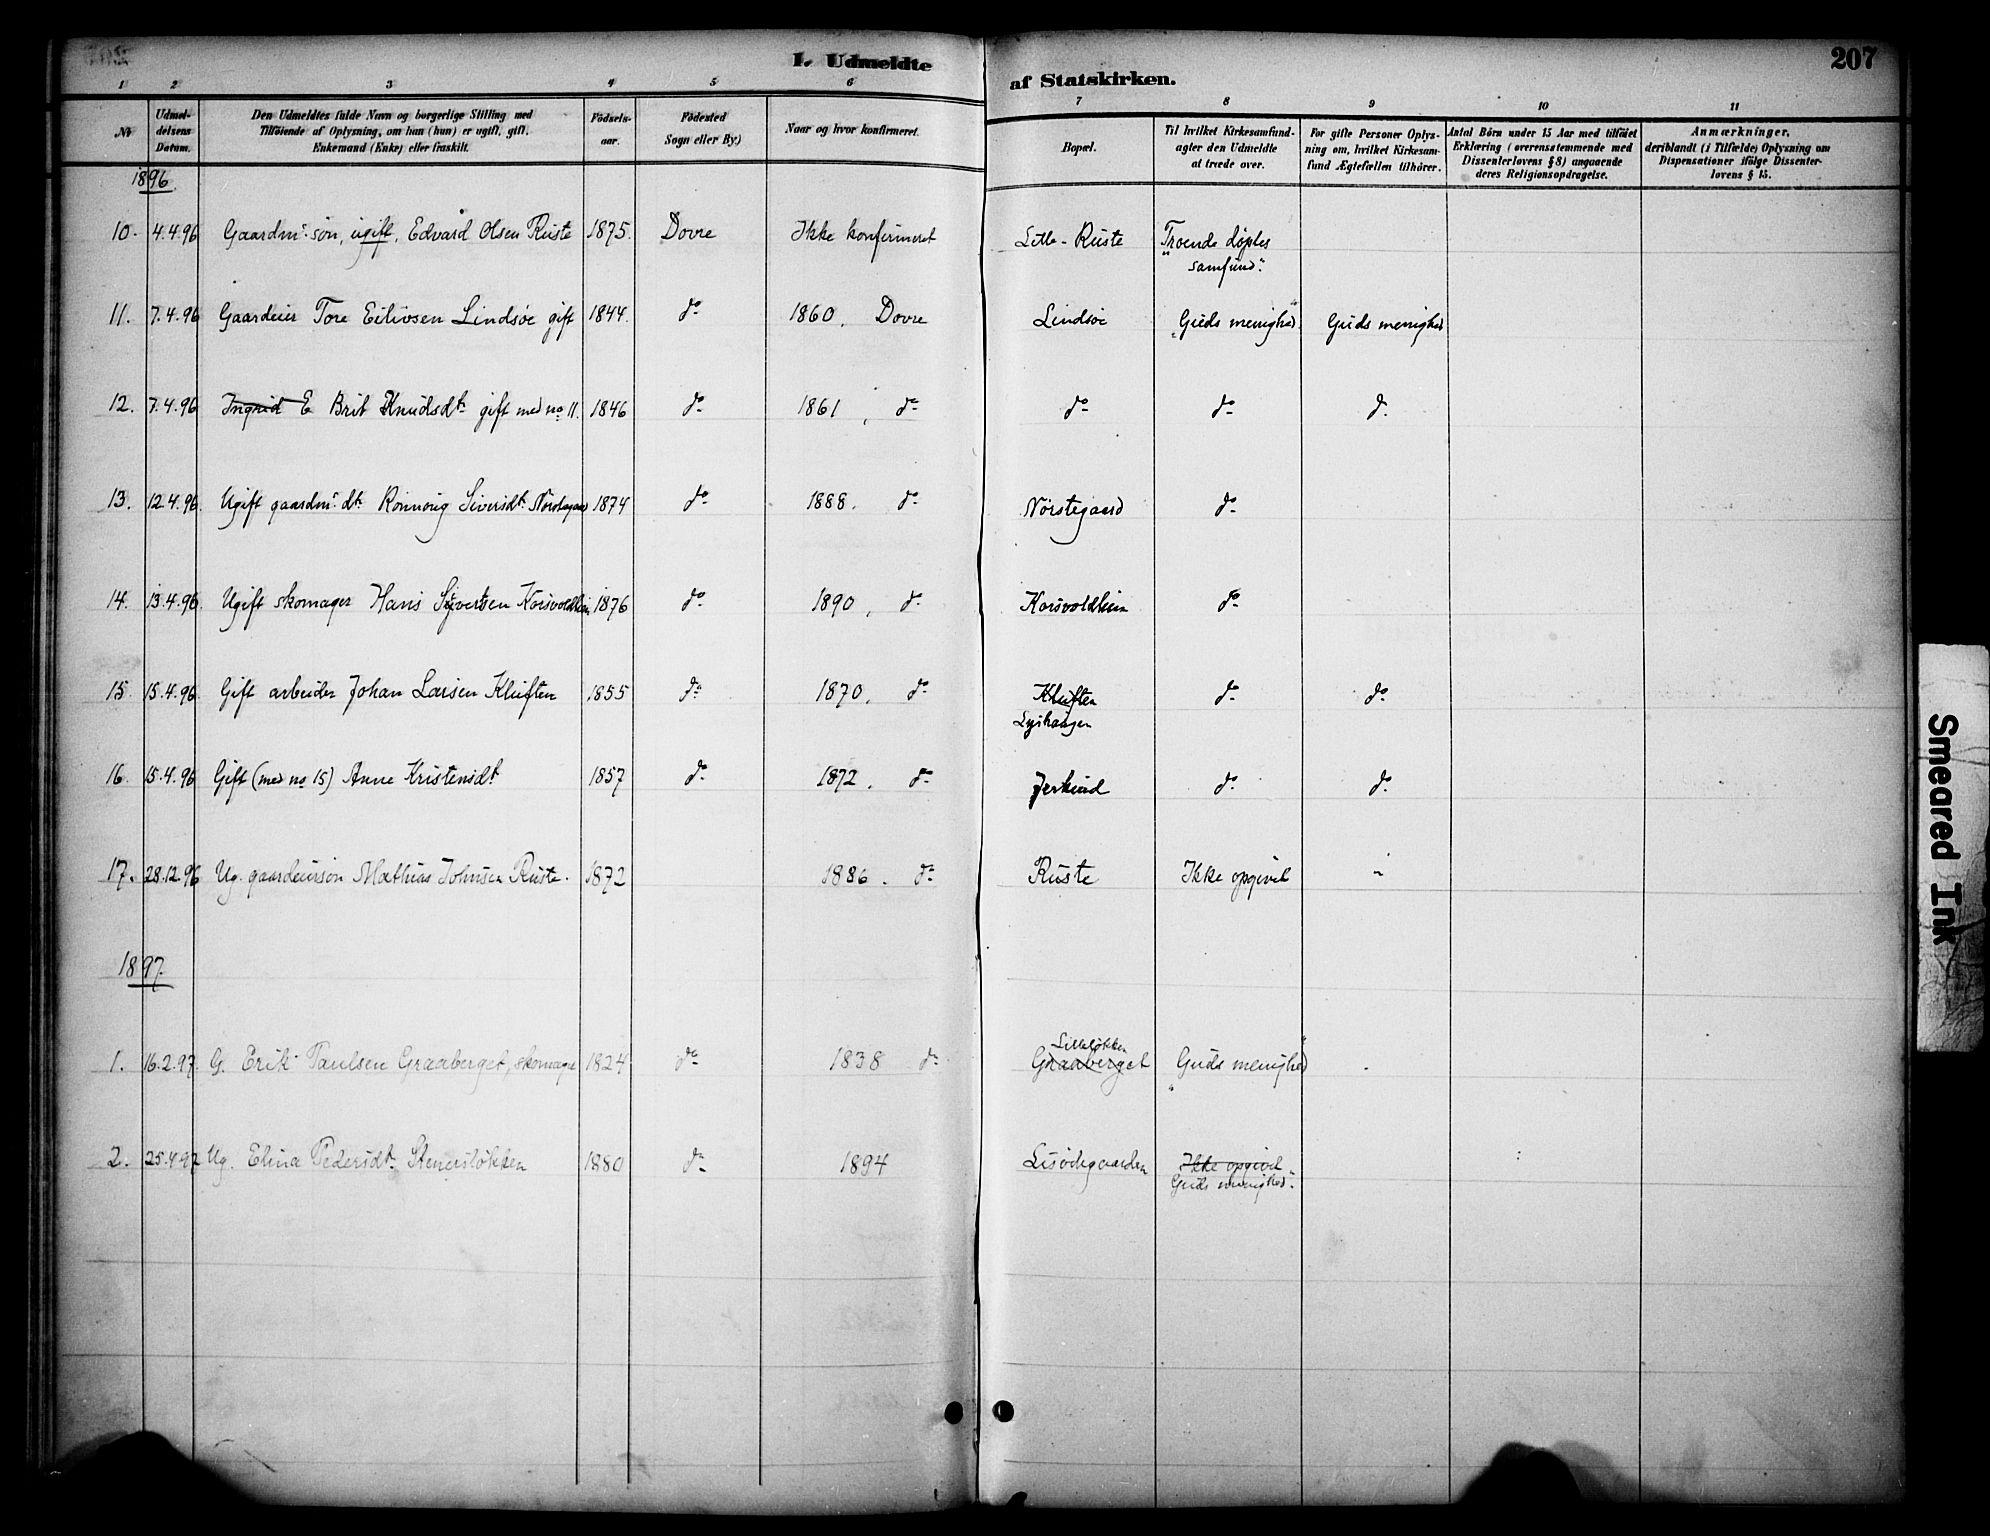 SAH, Dovre prestekontor, Ministerialbok nr. 3, 1891-1901, s. 207